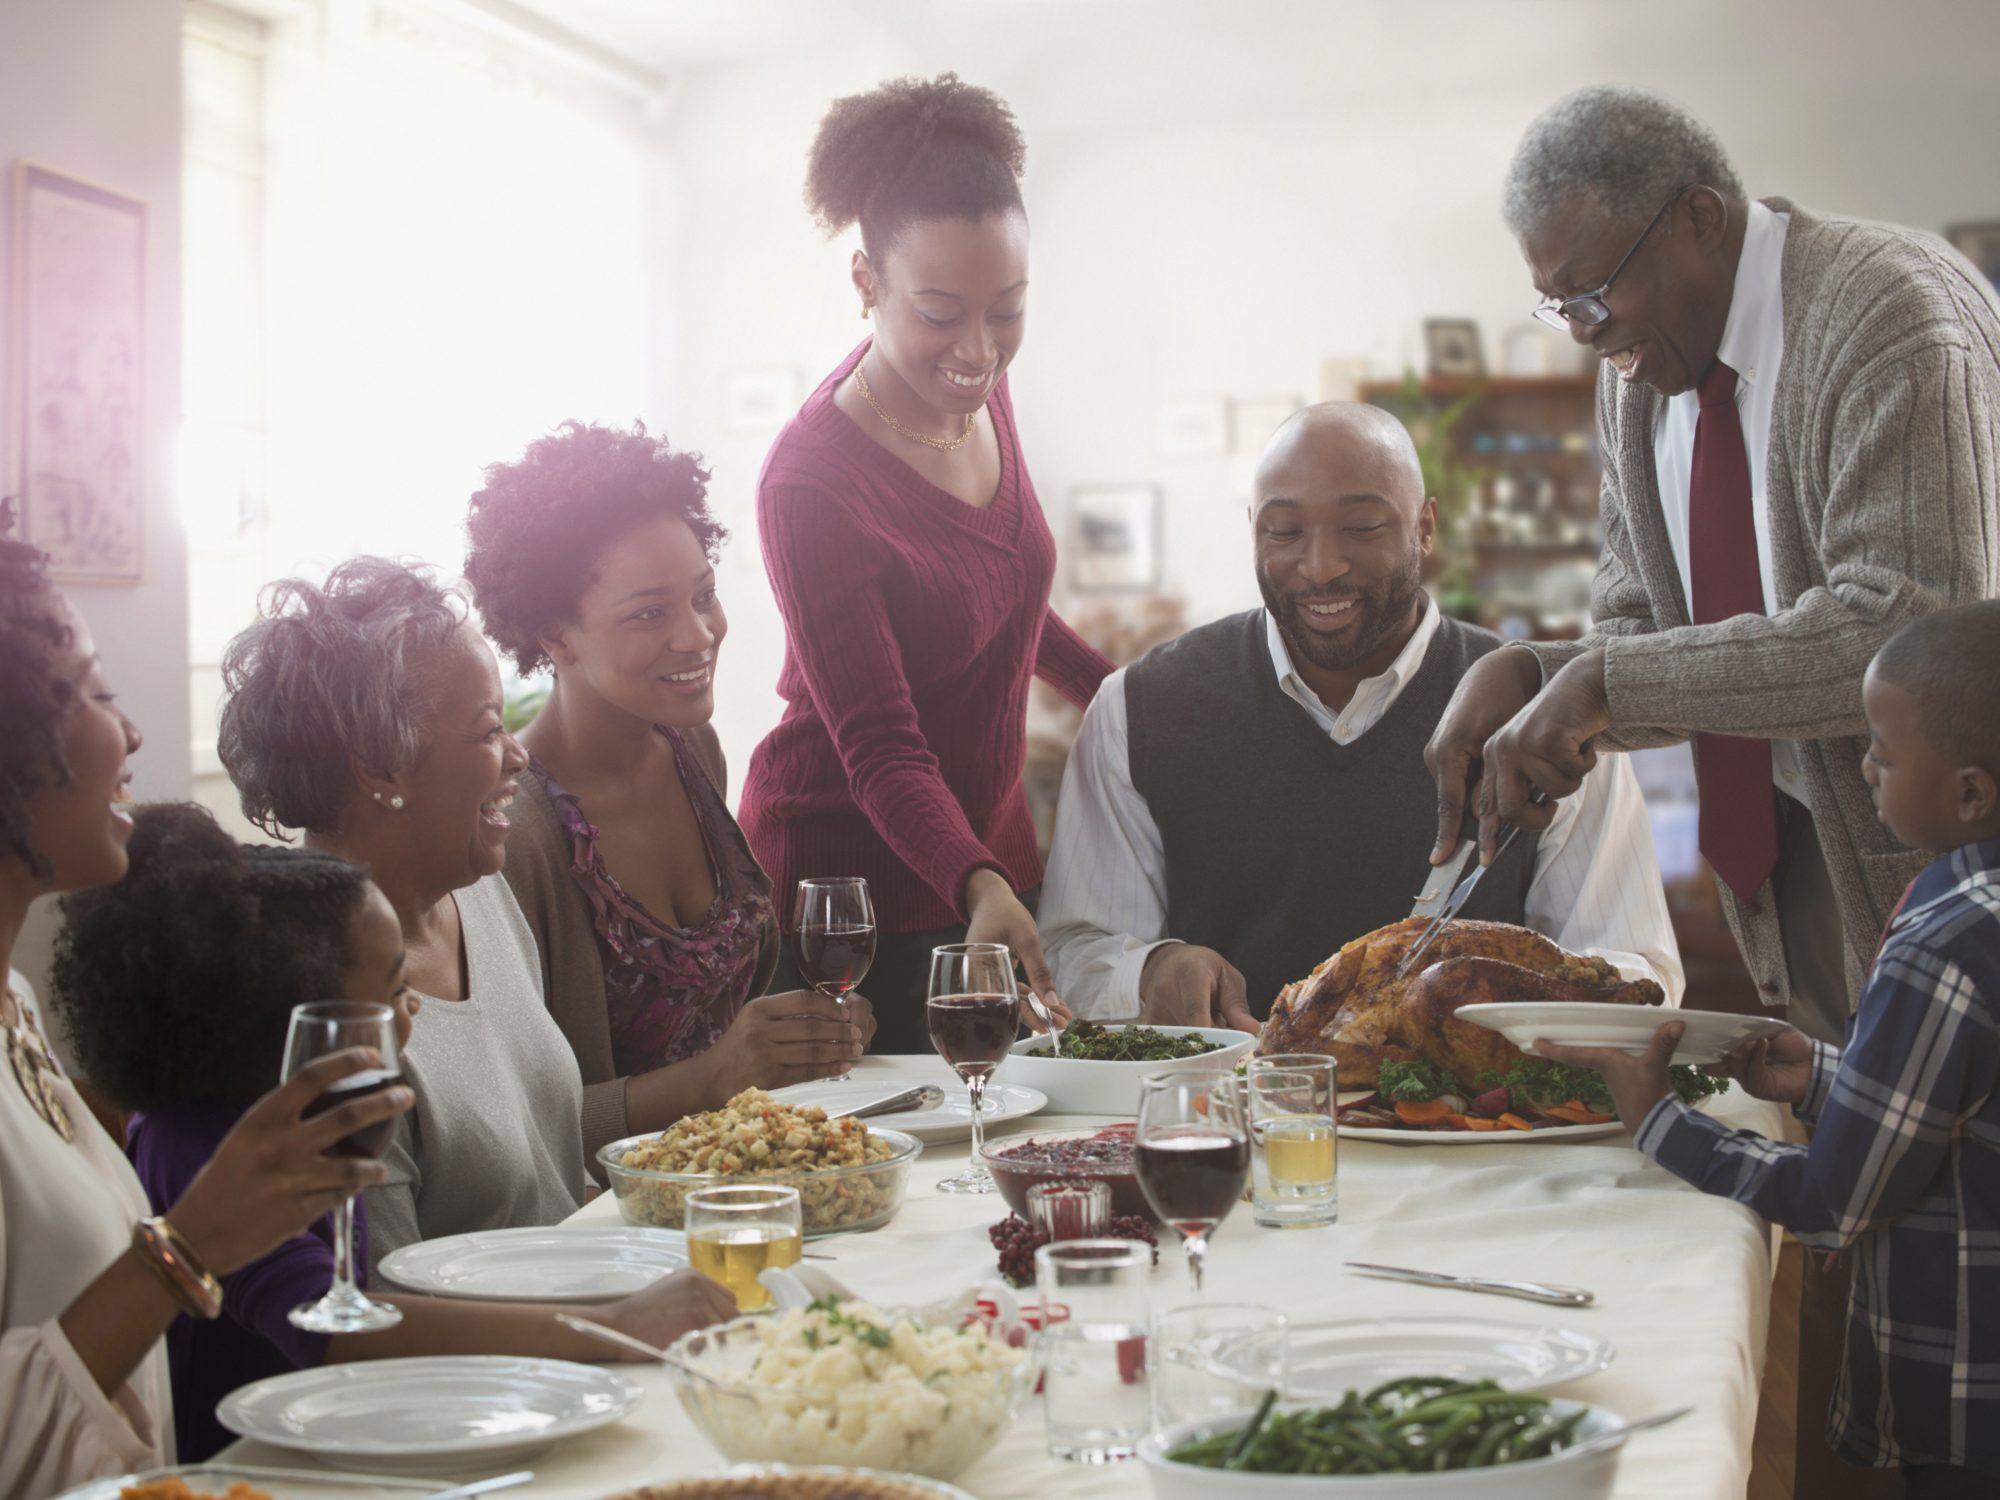 family-at-thanksgiving-table.jpg